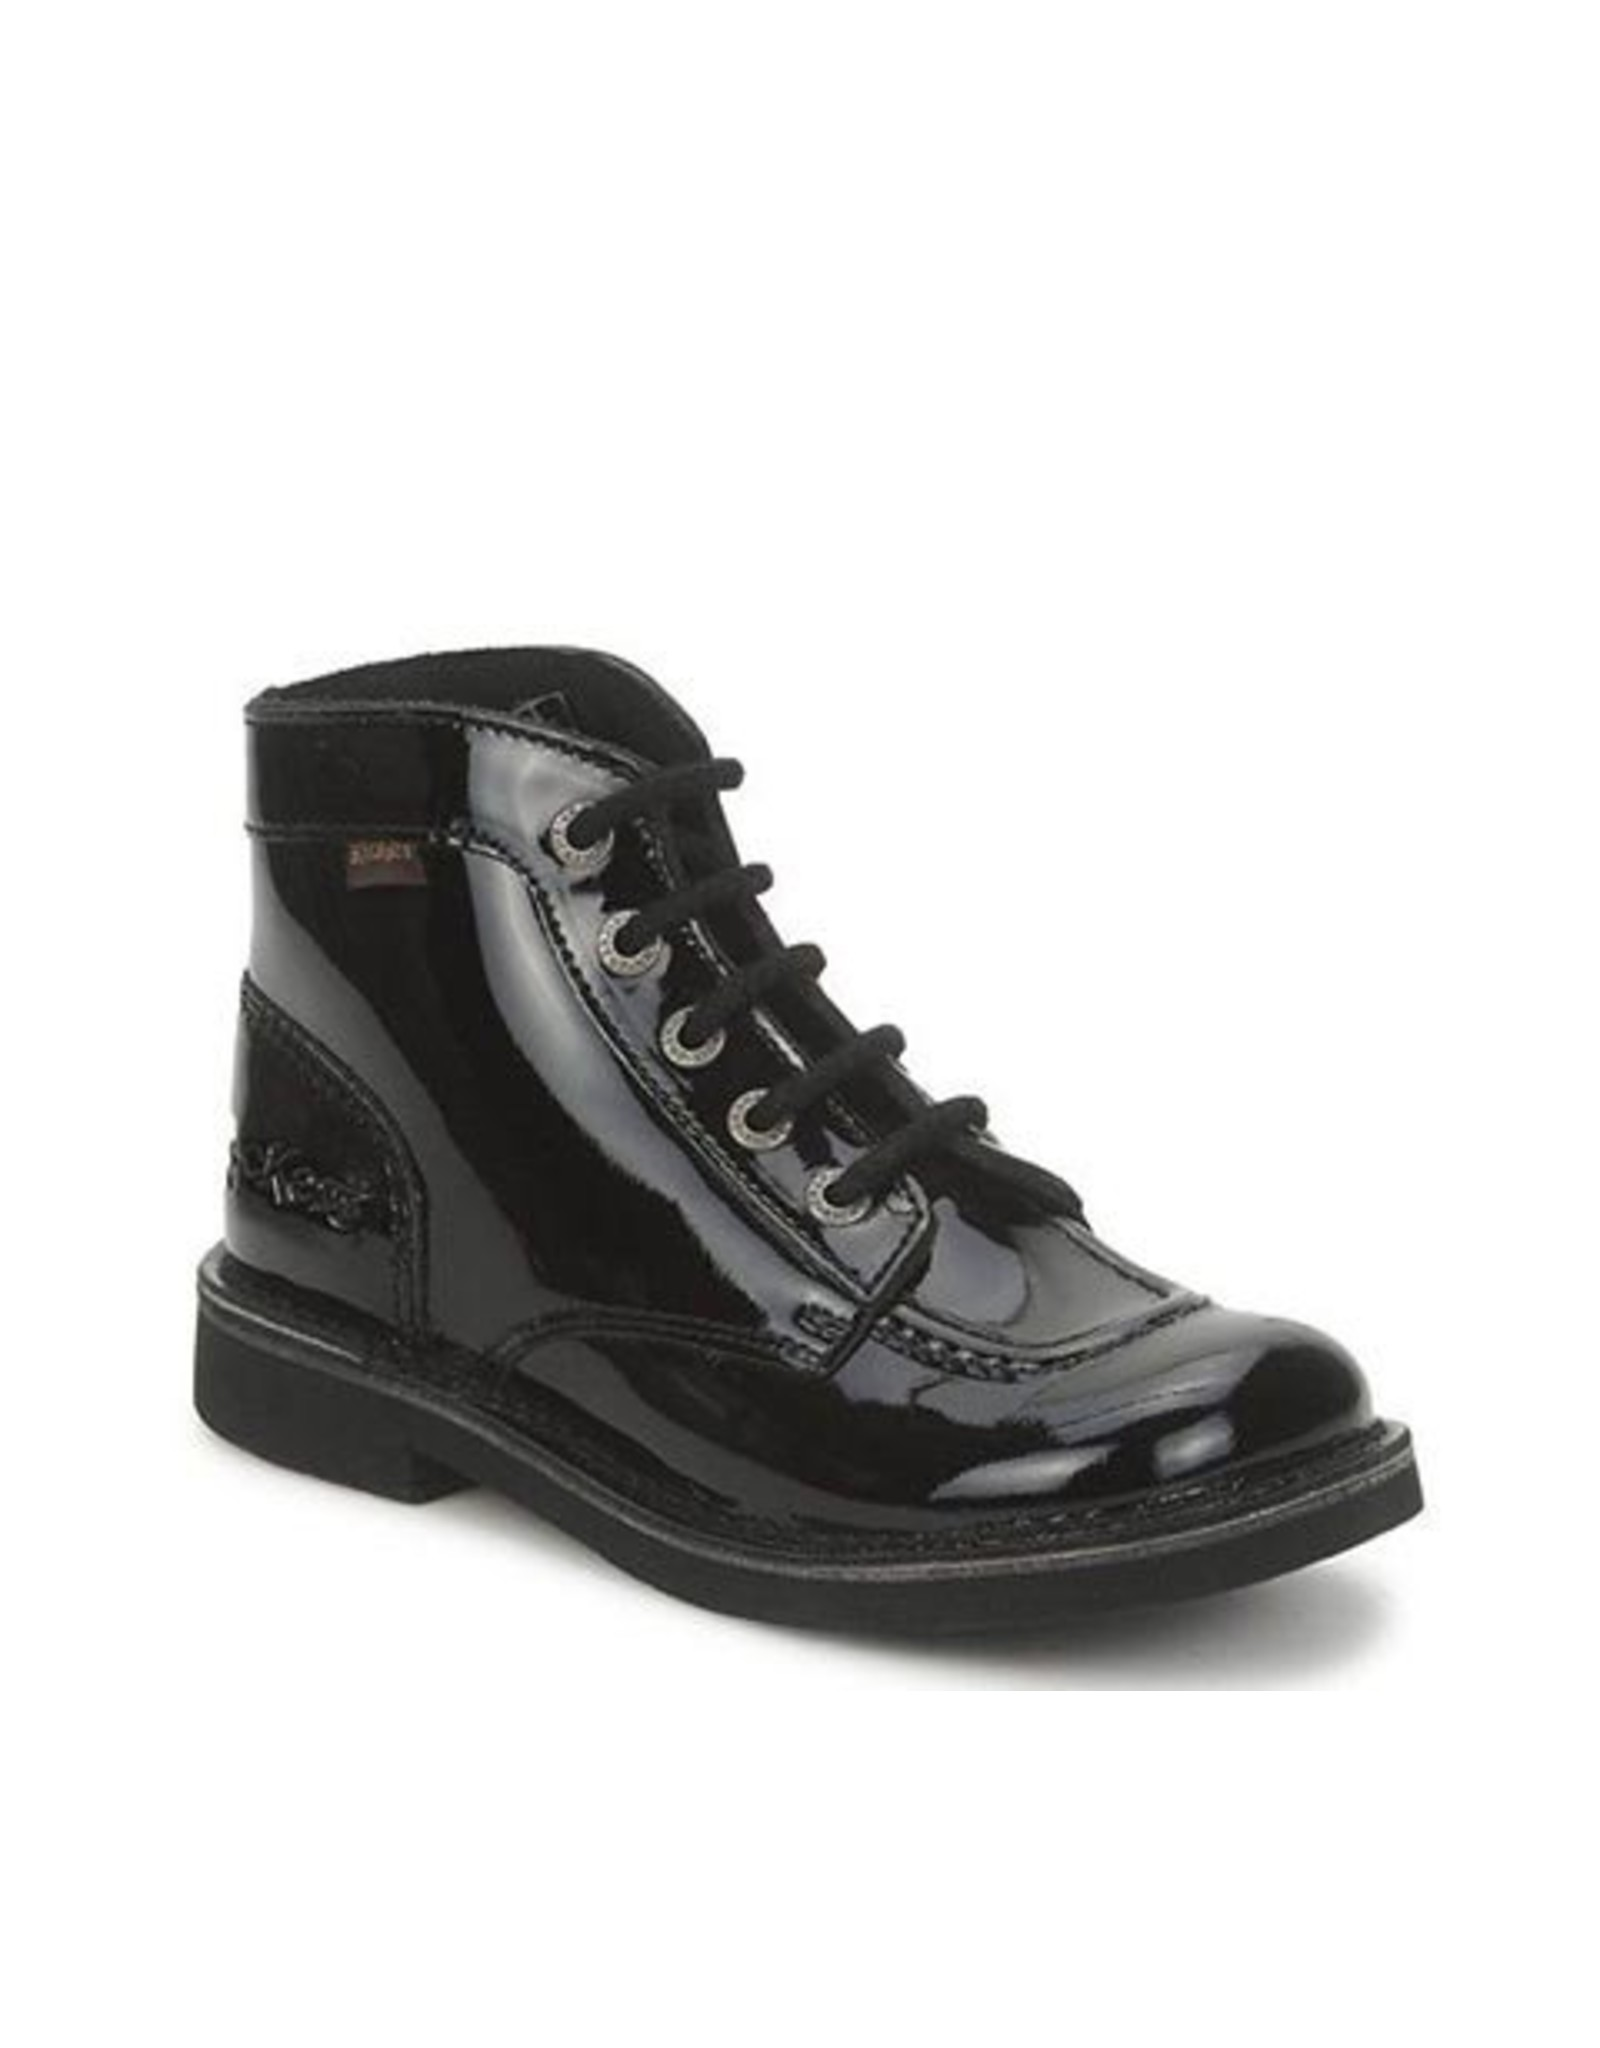 KICKERS KICK COL BLACK SHINY K1585PB